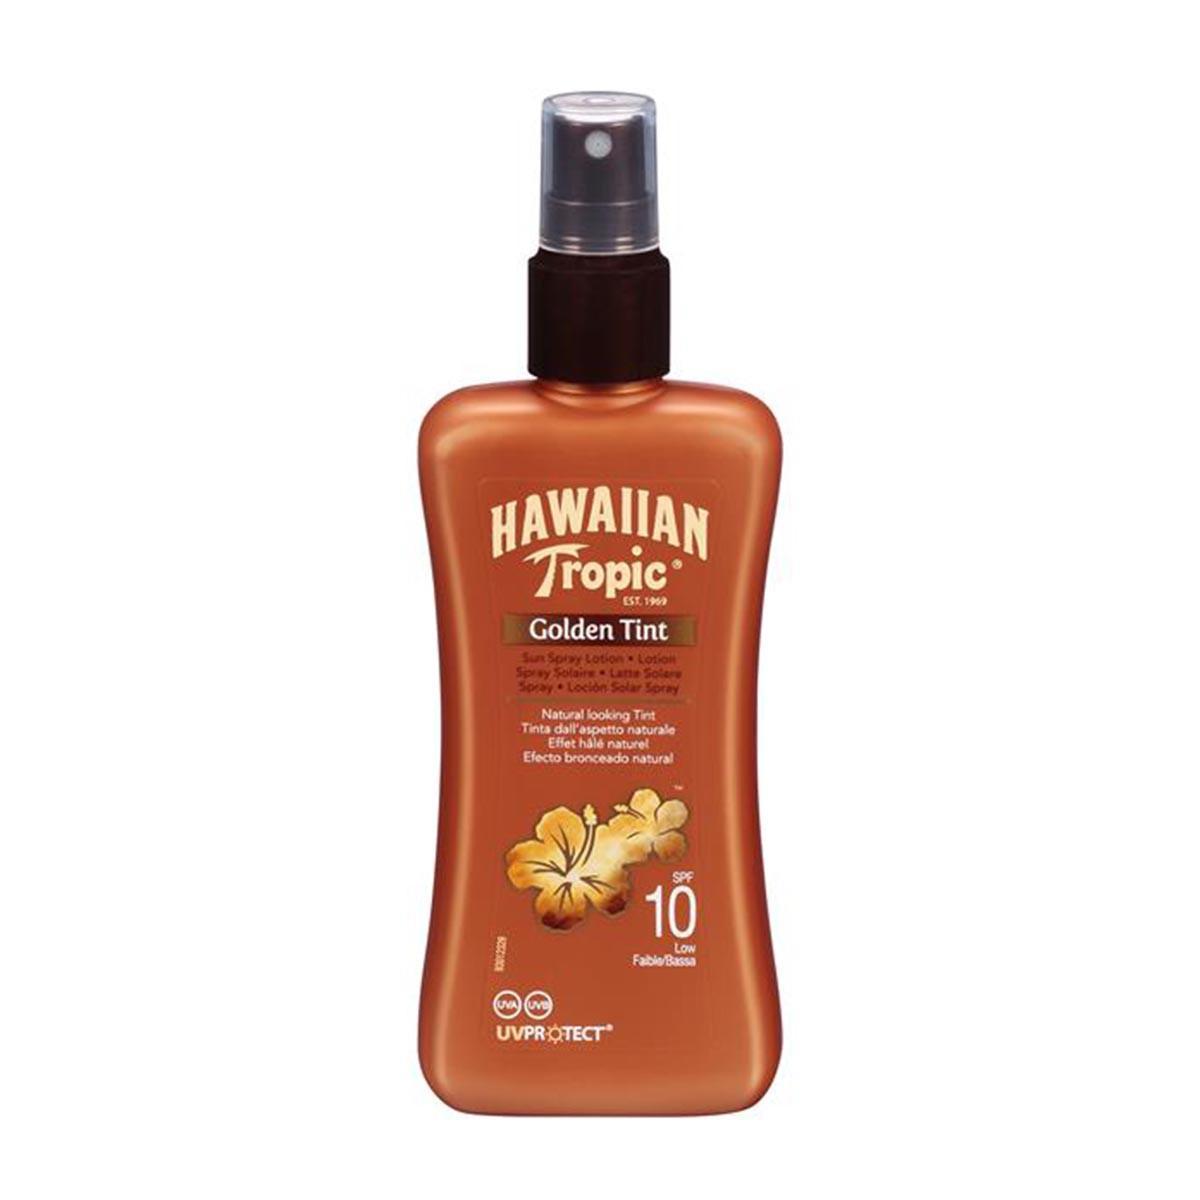 Cuidado de la piel Hawaiian-tropic Golden Tint